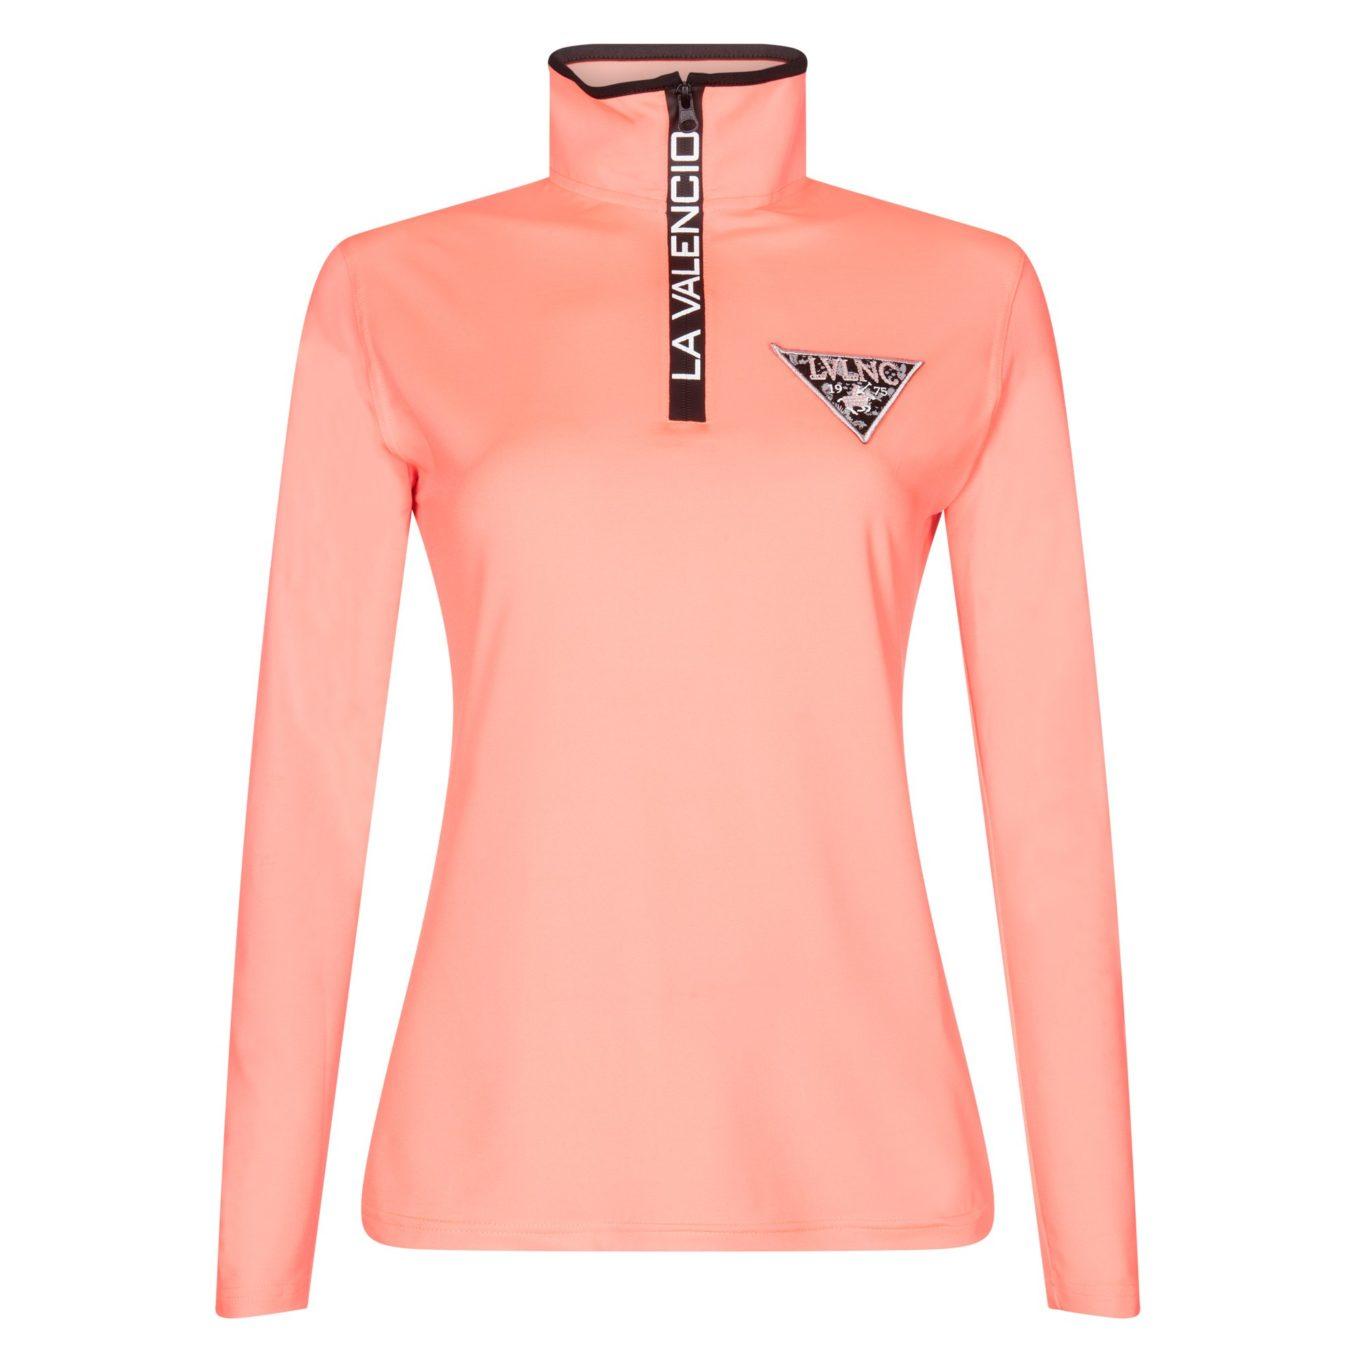 2fb13811c Camiseta técnica naranja fosforito con logo en el pecho para niña ...